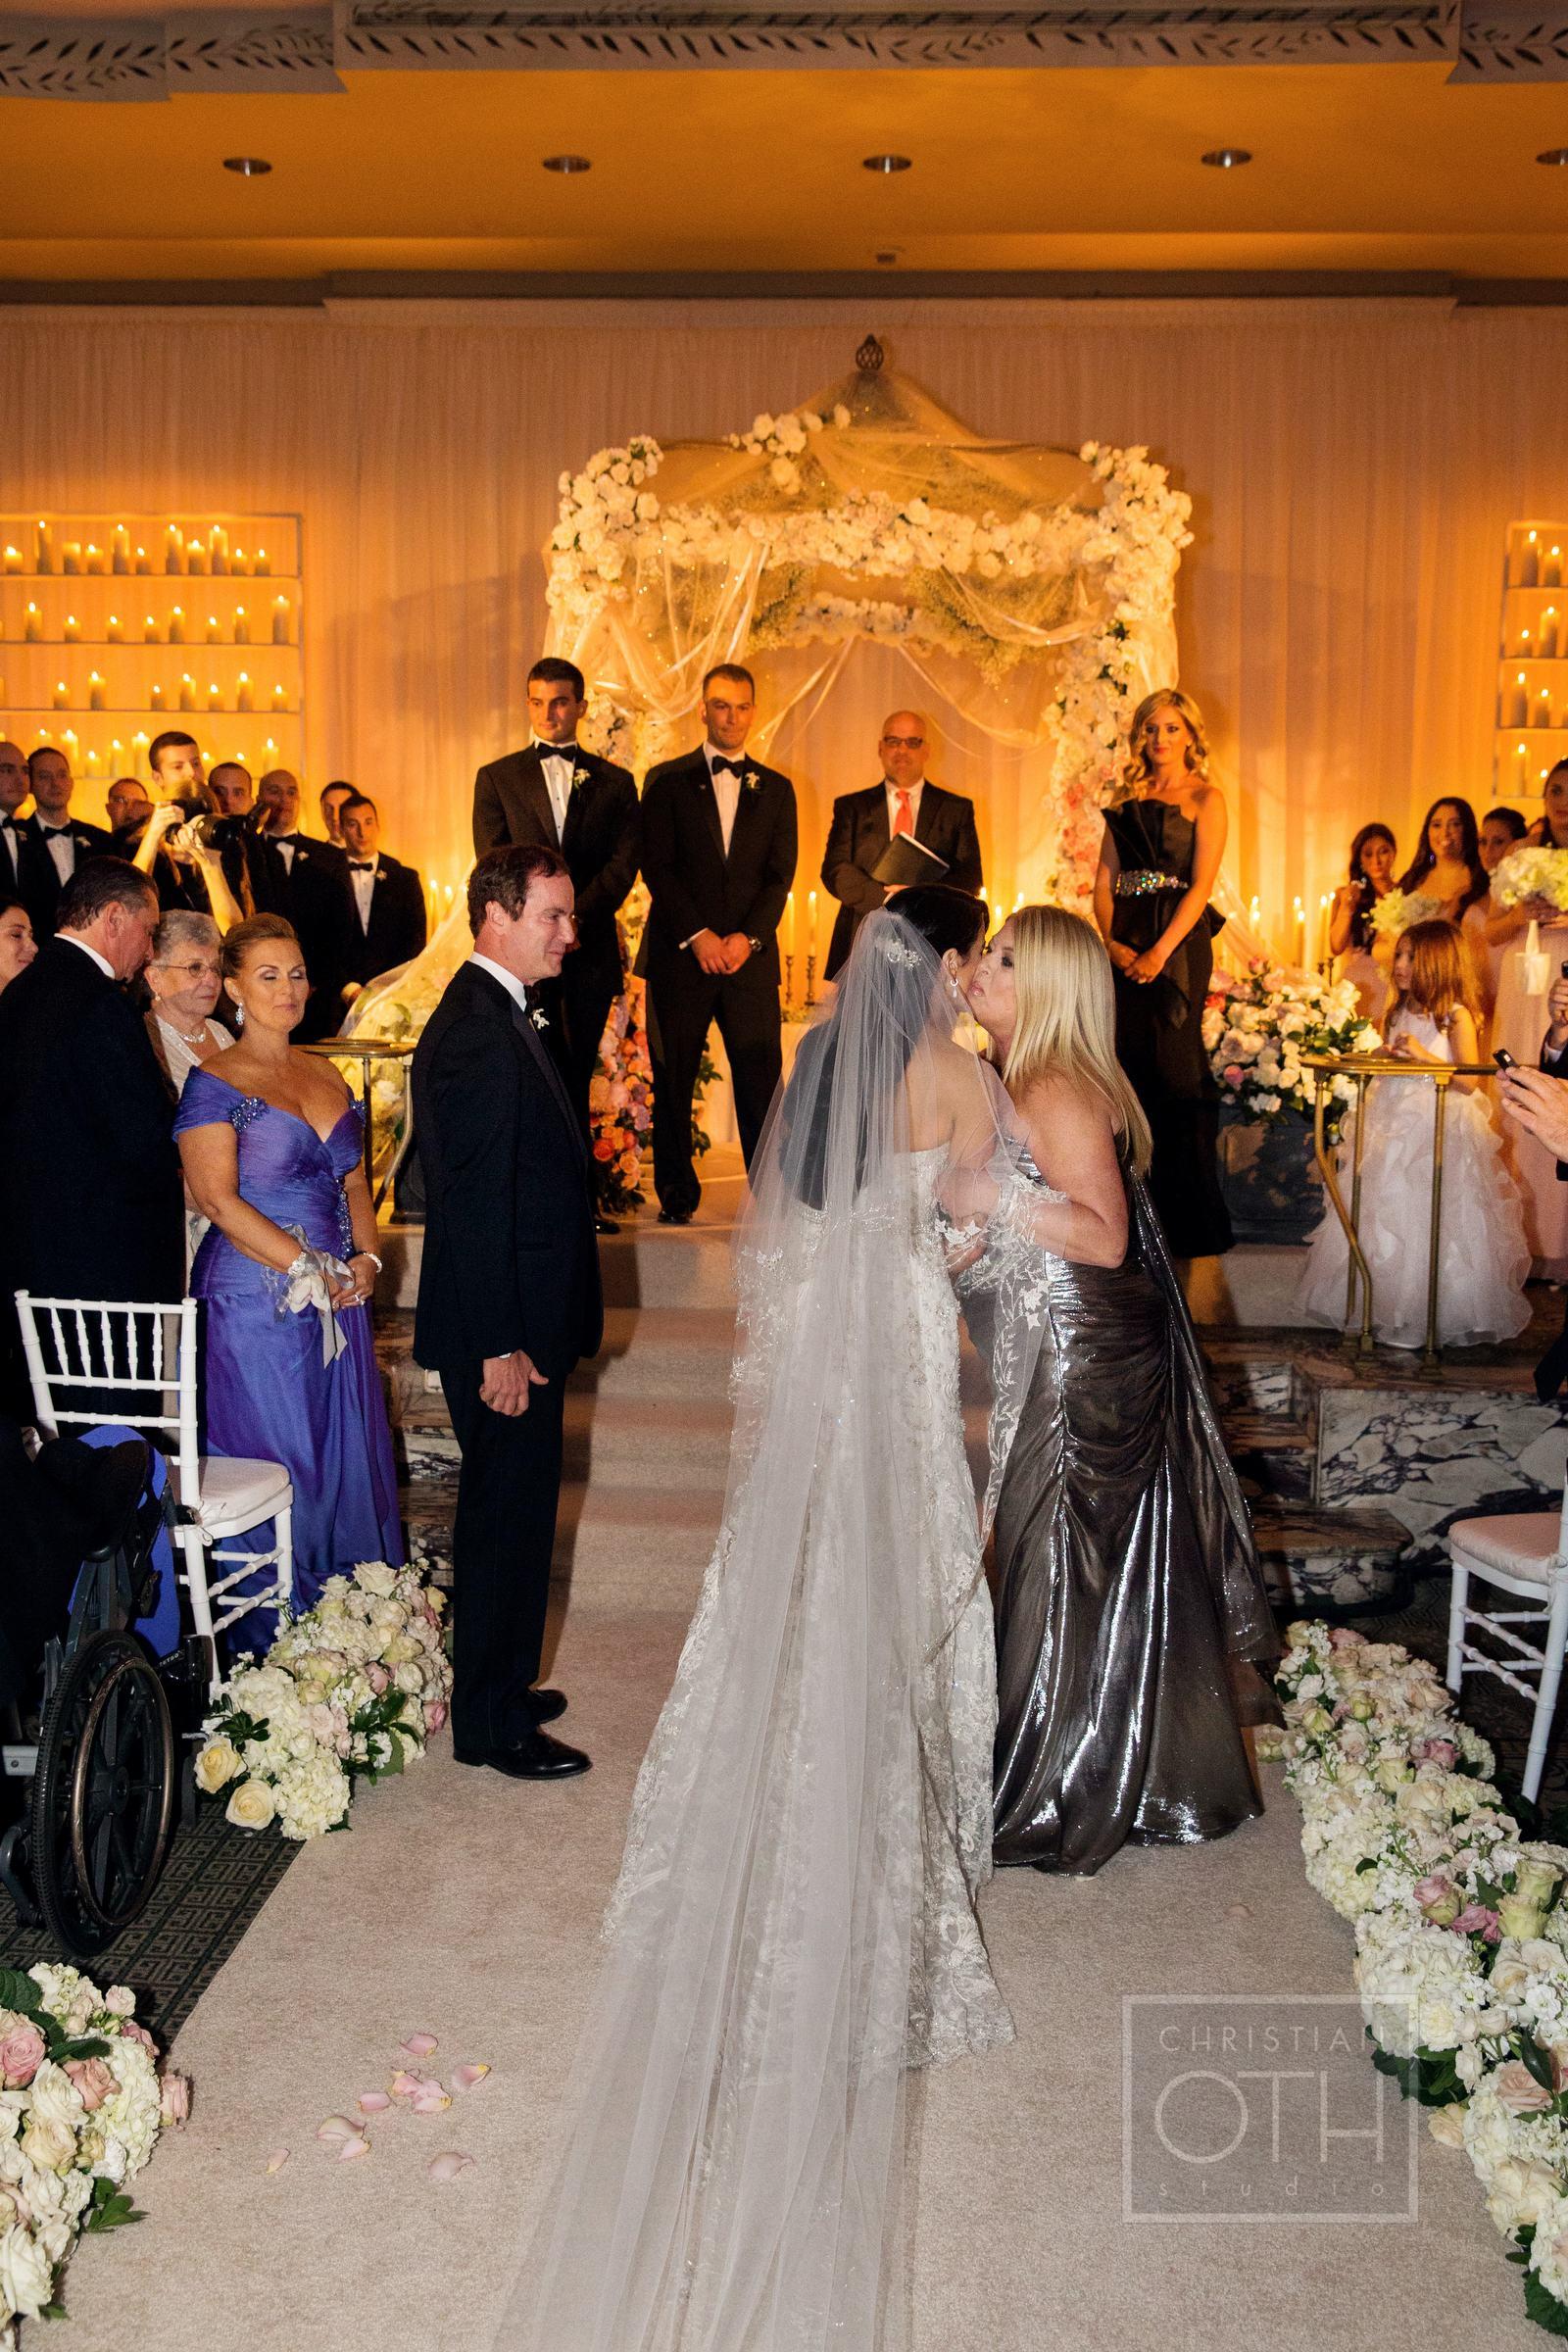 Ceci_New_York_Custom_Invitation_Pierre__City_ Destination_Wedding_Luxury_Personalized_Ceci_Style_Bride_Rose_Gold_Foil_Stamping93.JPG